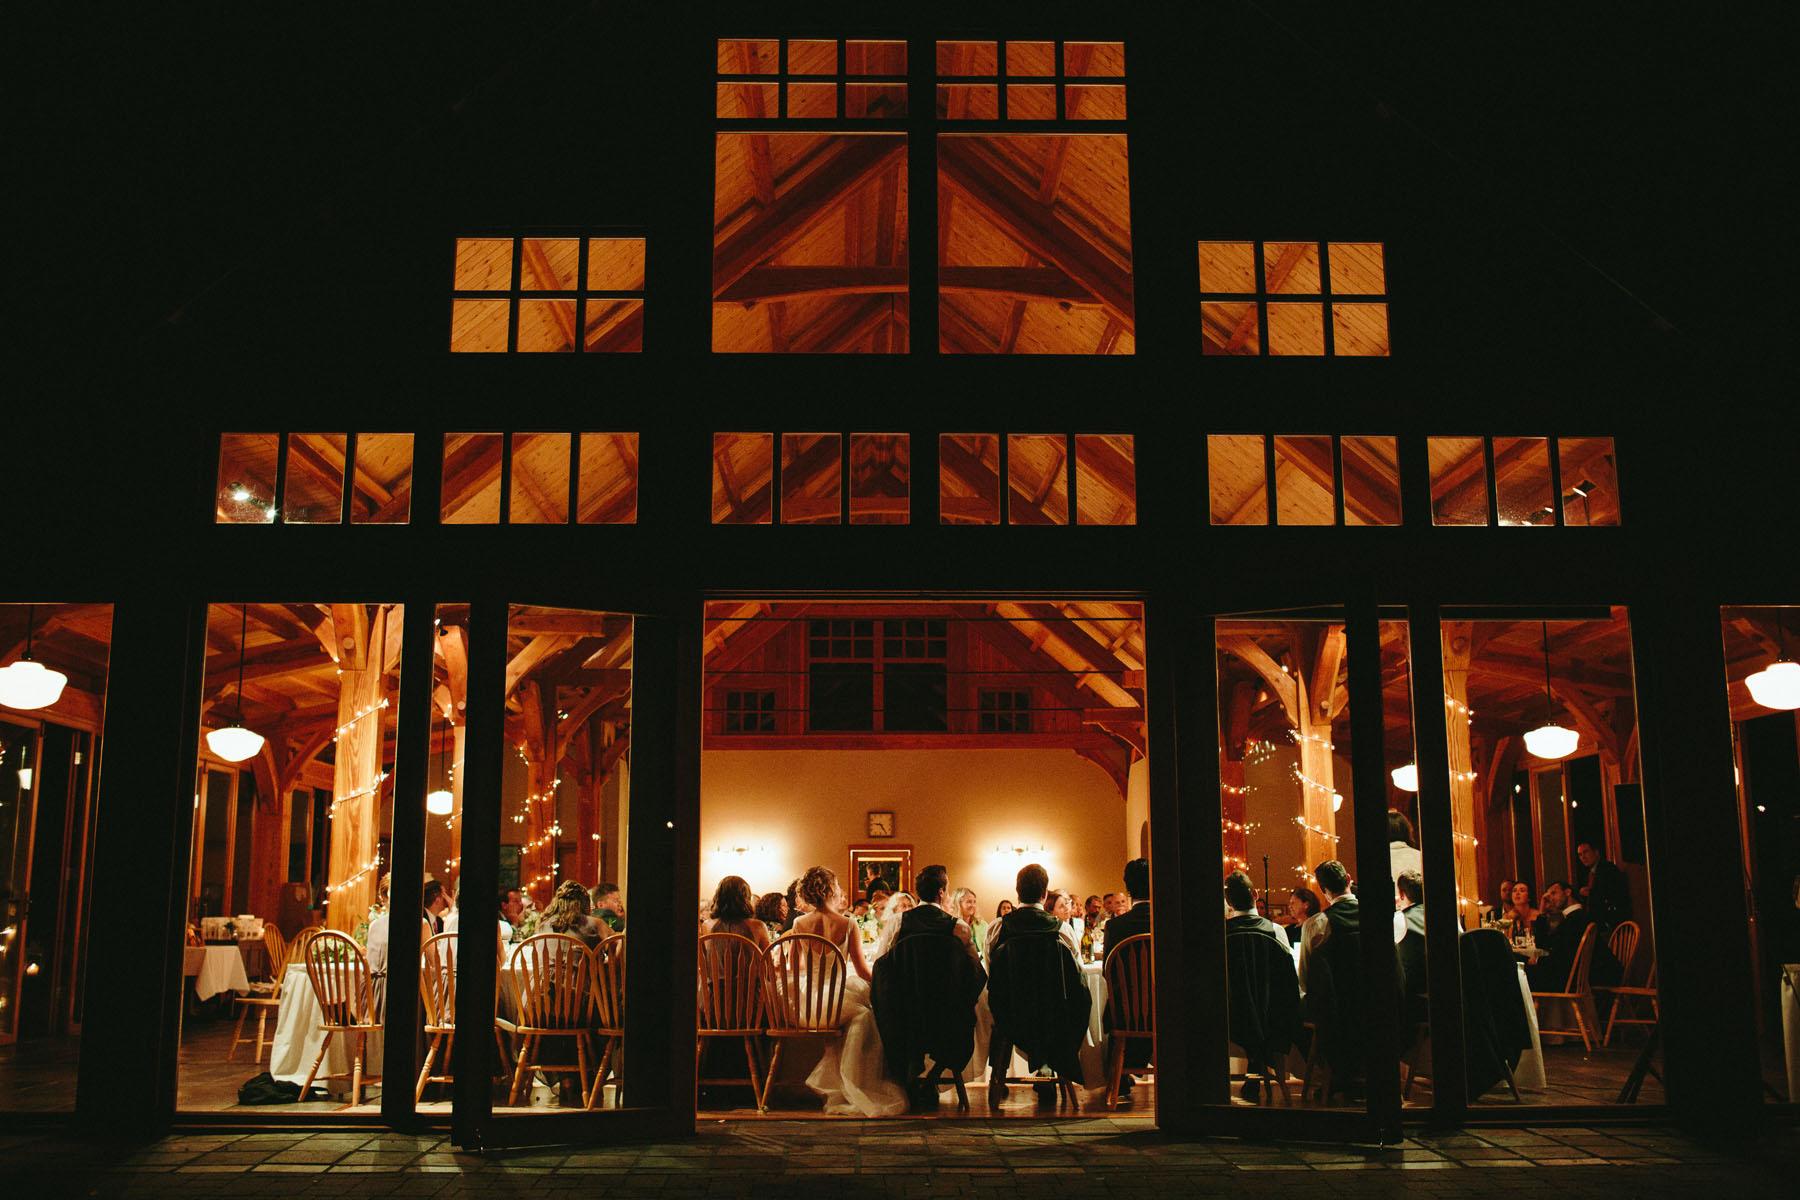 thetis-island-wedding-photographer-rp-rn-199.jpg